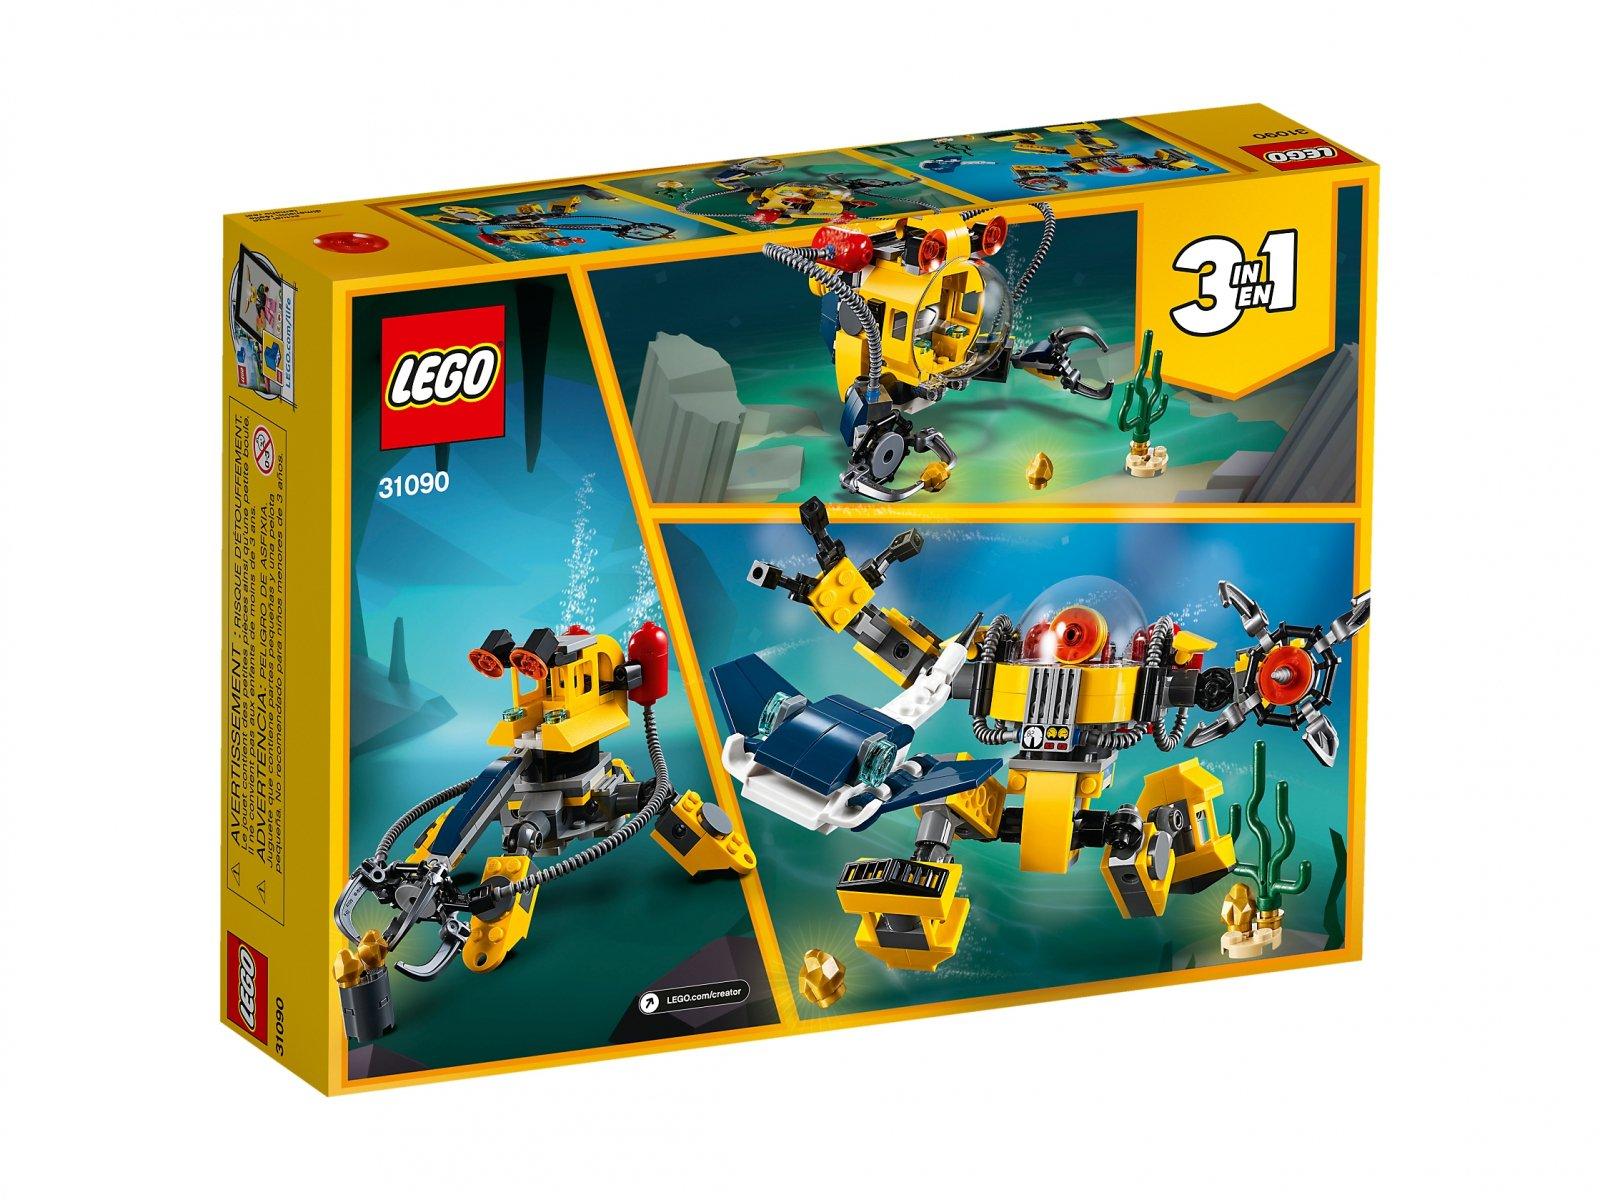 LEGO Creator 3 w 1 Podwodny robot